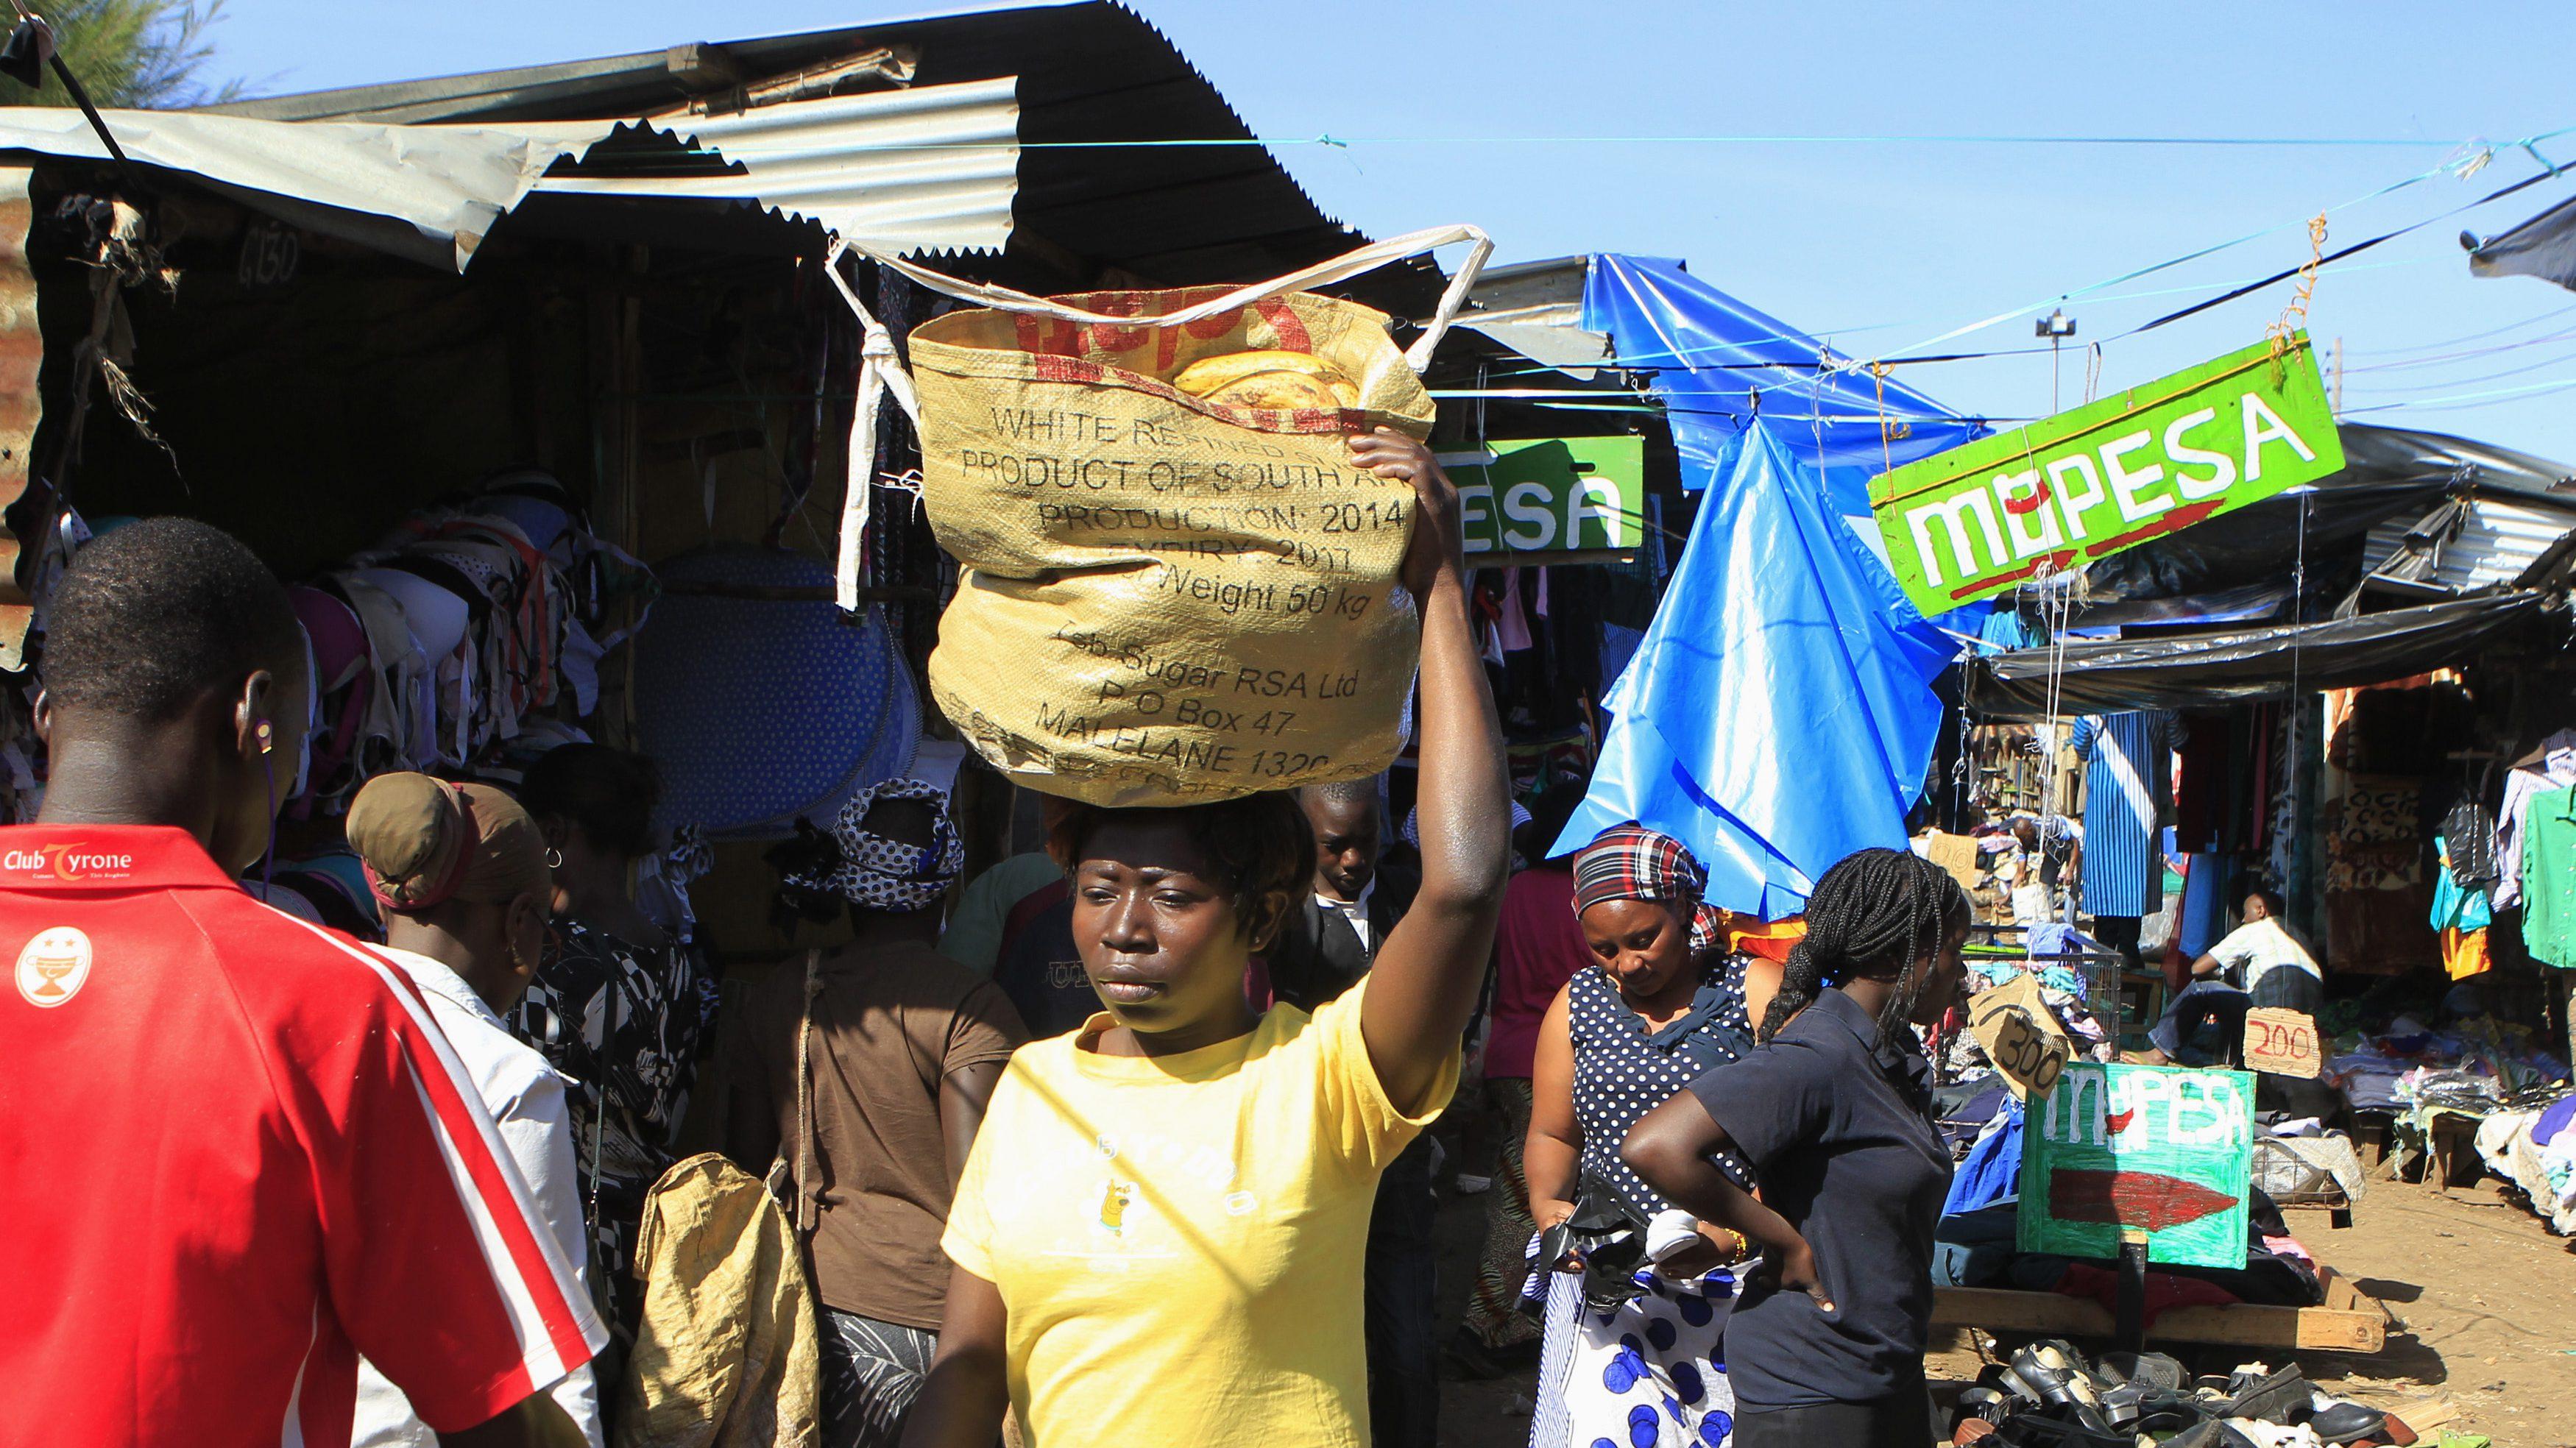 Kibera residents walk past an M-Pesa banner at an open-air market in Kenya's capital Nairobi